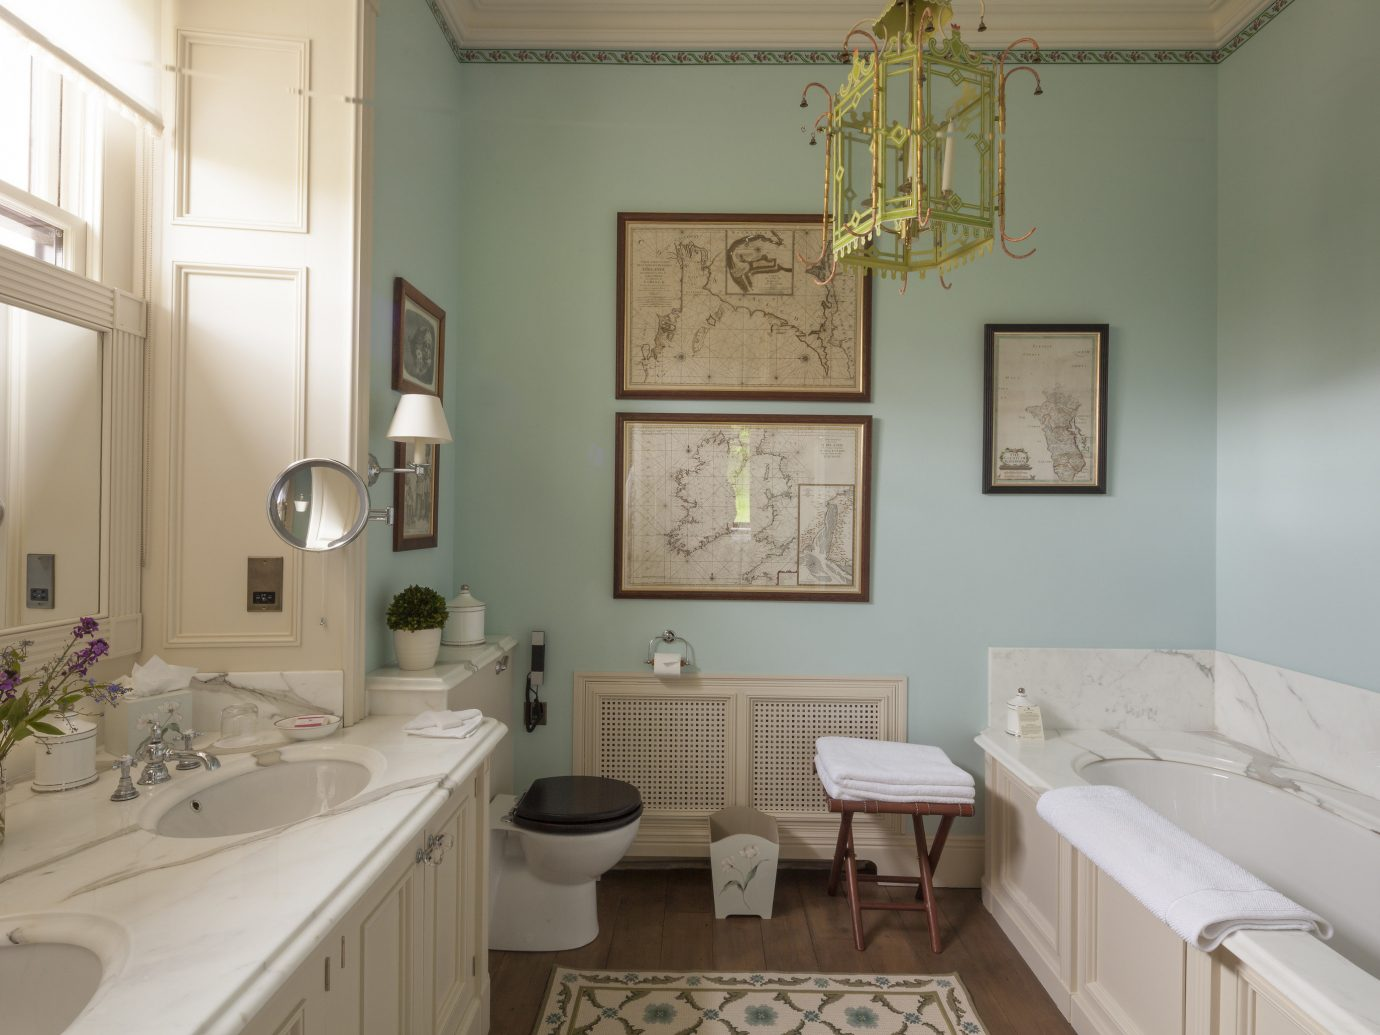 All-Inclusive Resorts Hotels wall indoor floor bathroom room home interior design estate window real estate interior designer decorated